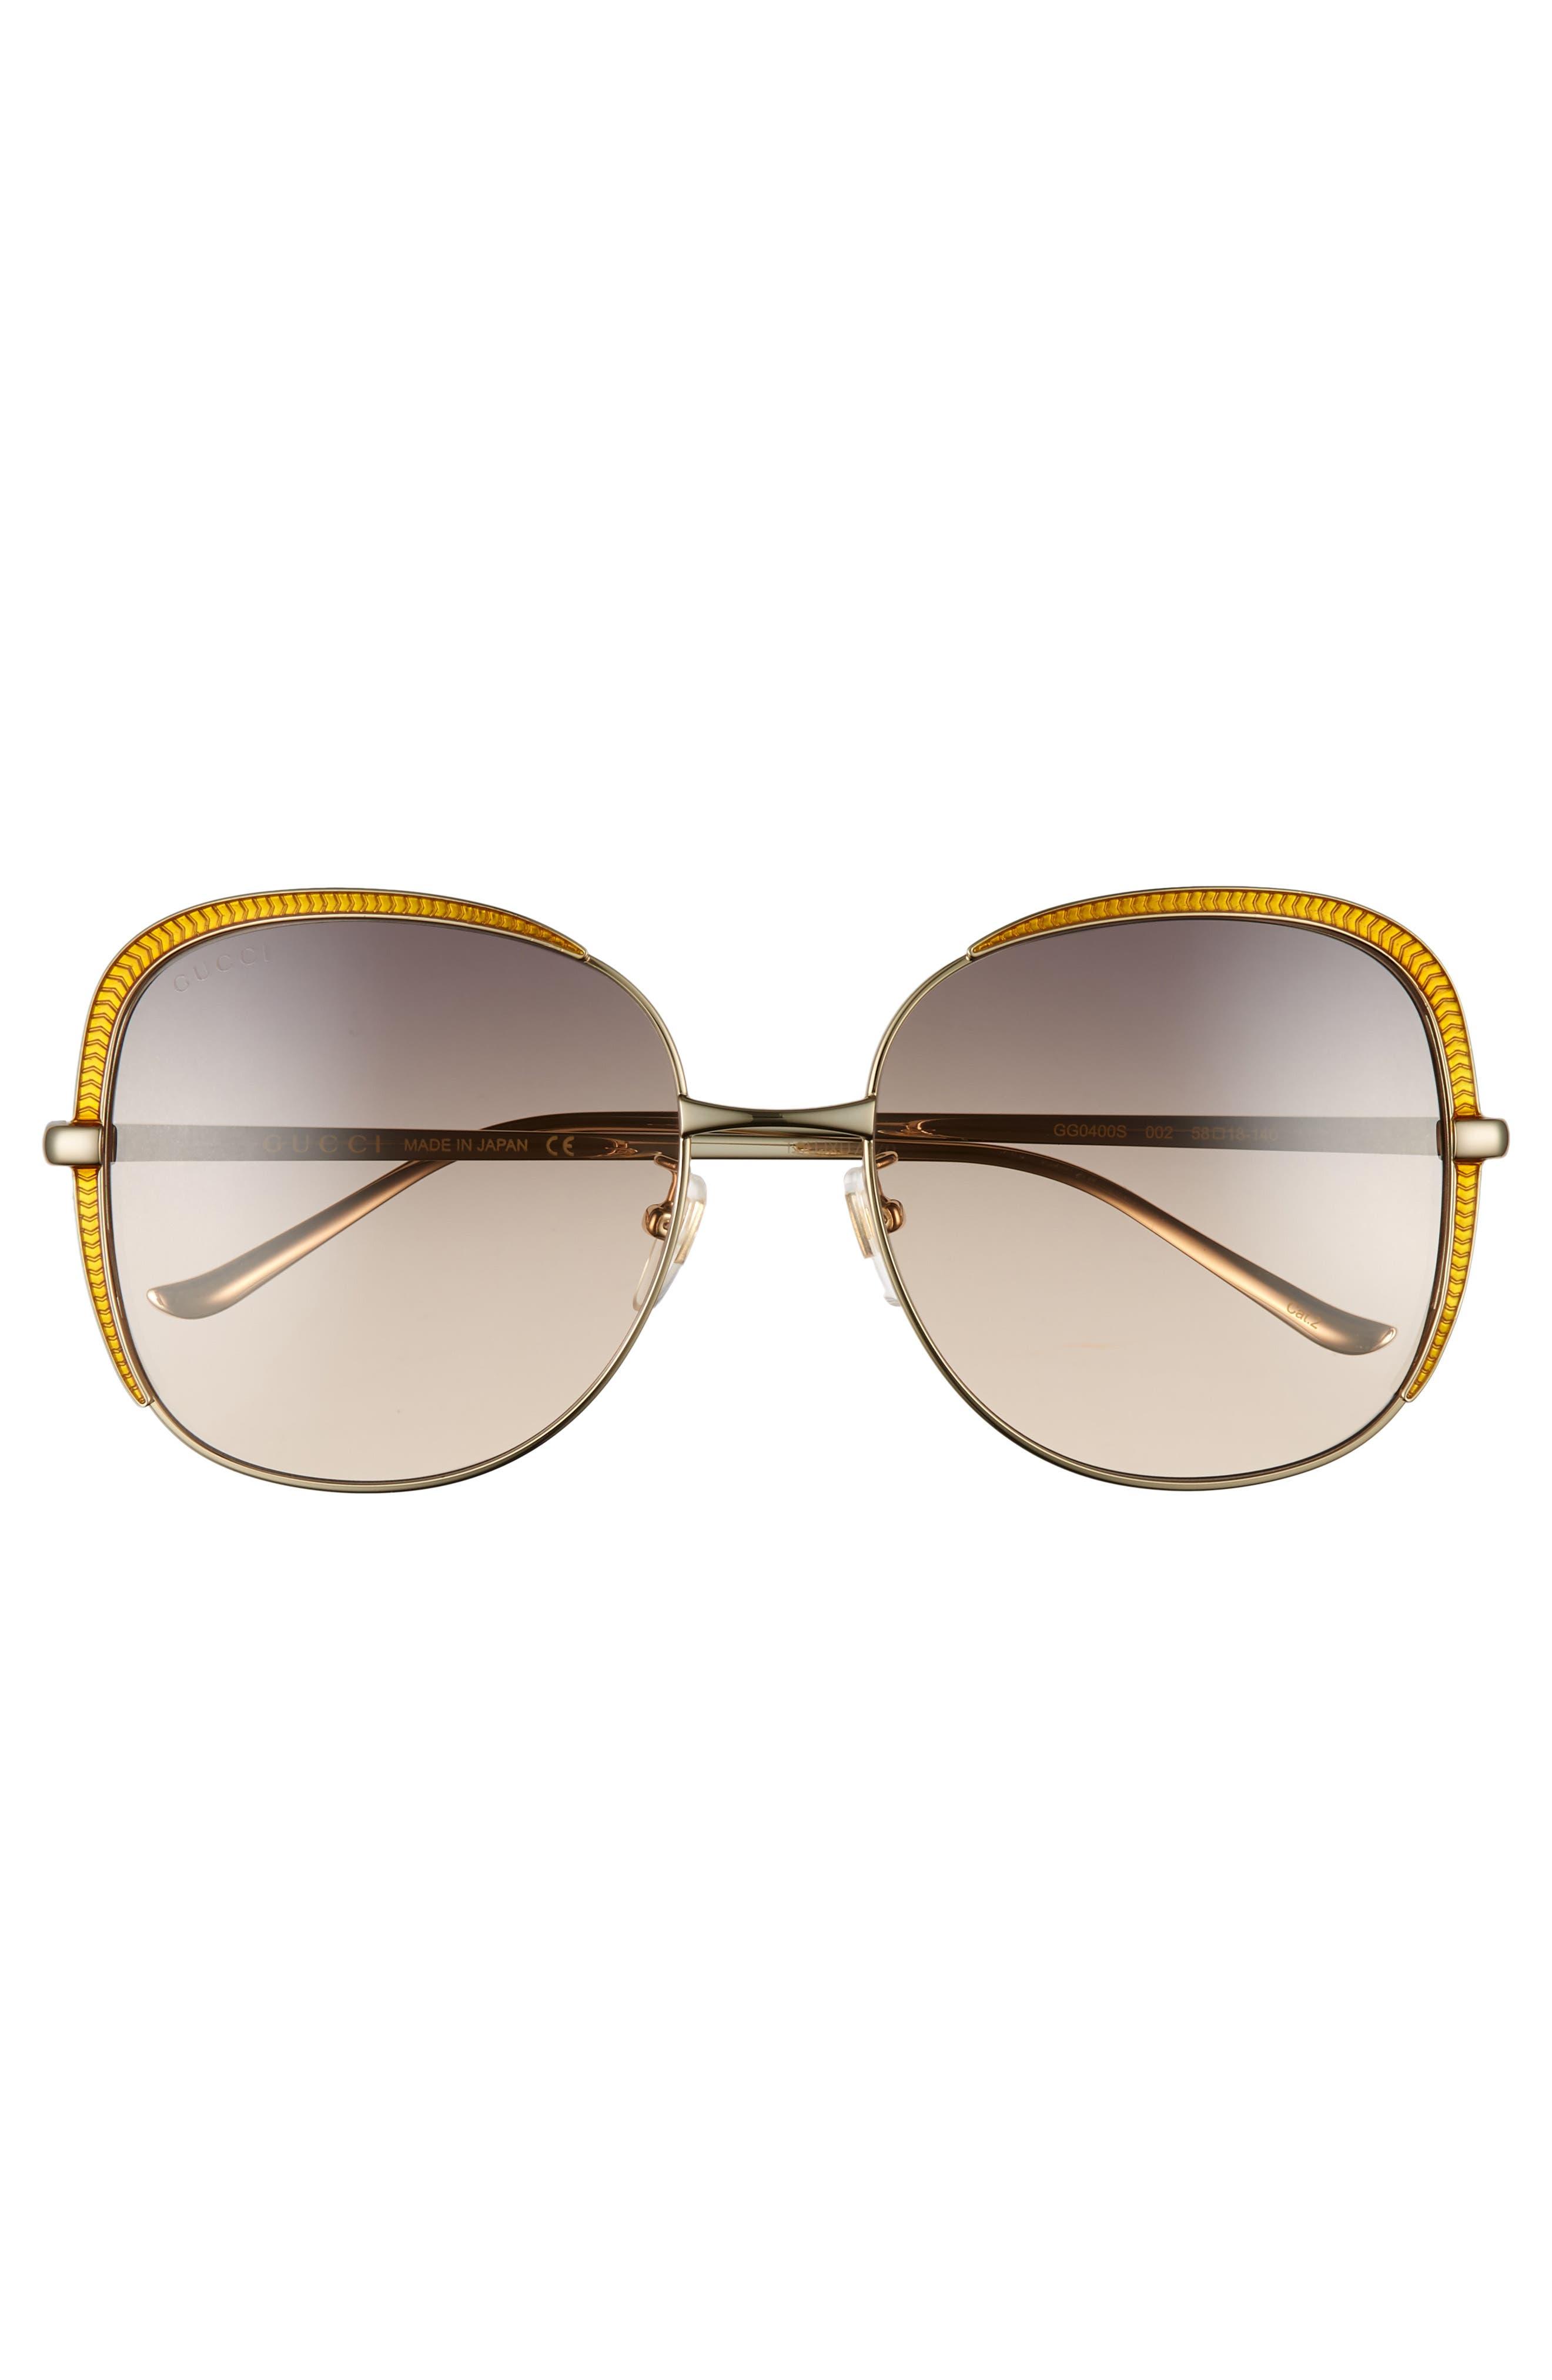 58mm Gradient Sunglasses,                             Alternate thumbnail 3, color,                             GOLD/ PINK/ GREY GRADIENT